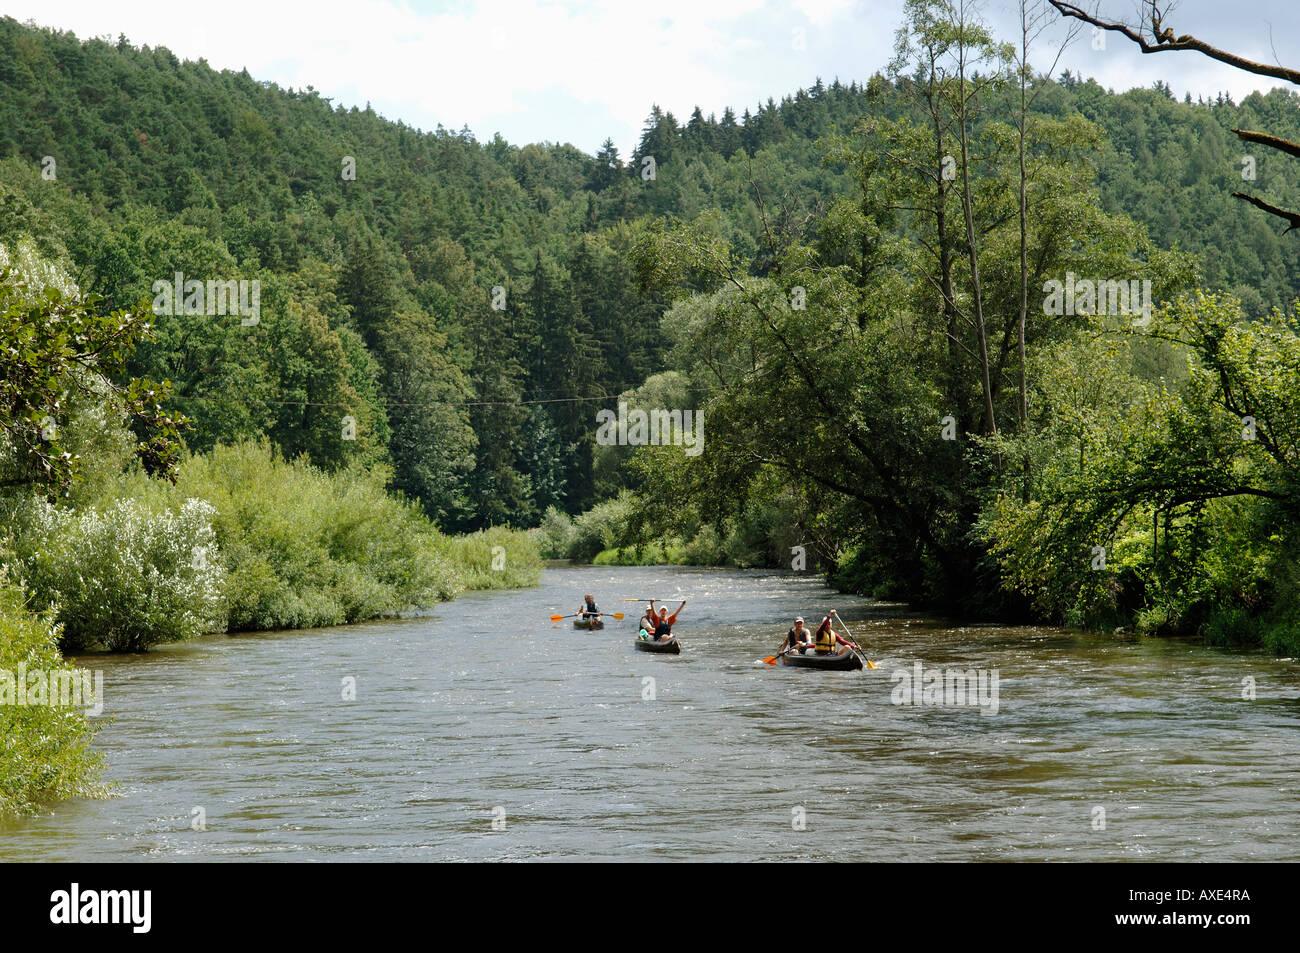 Boats on the Vltava river near Zlata Koruna, South Bohemia, Czech Republic - Stock Image